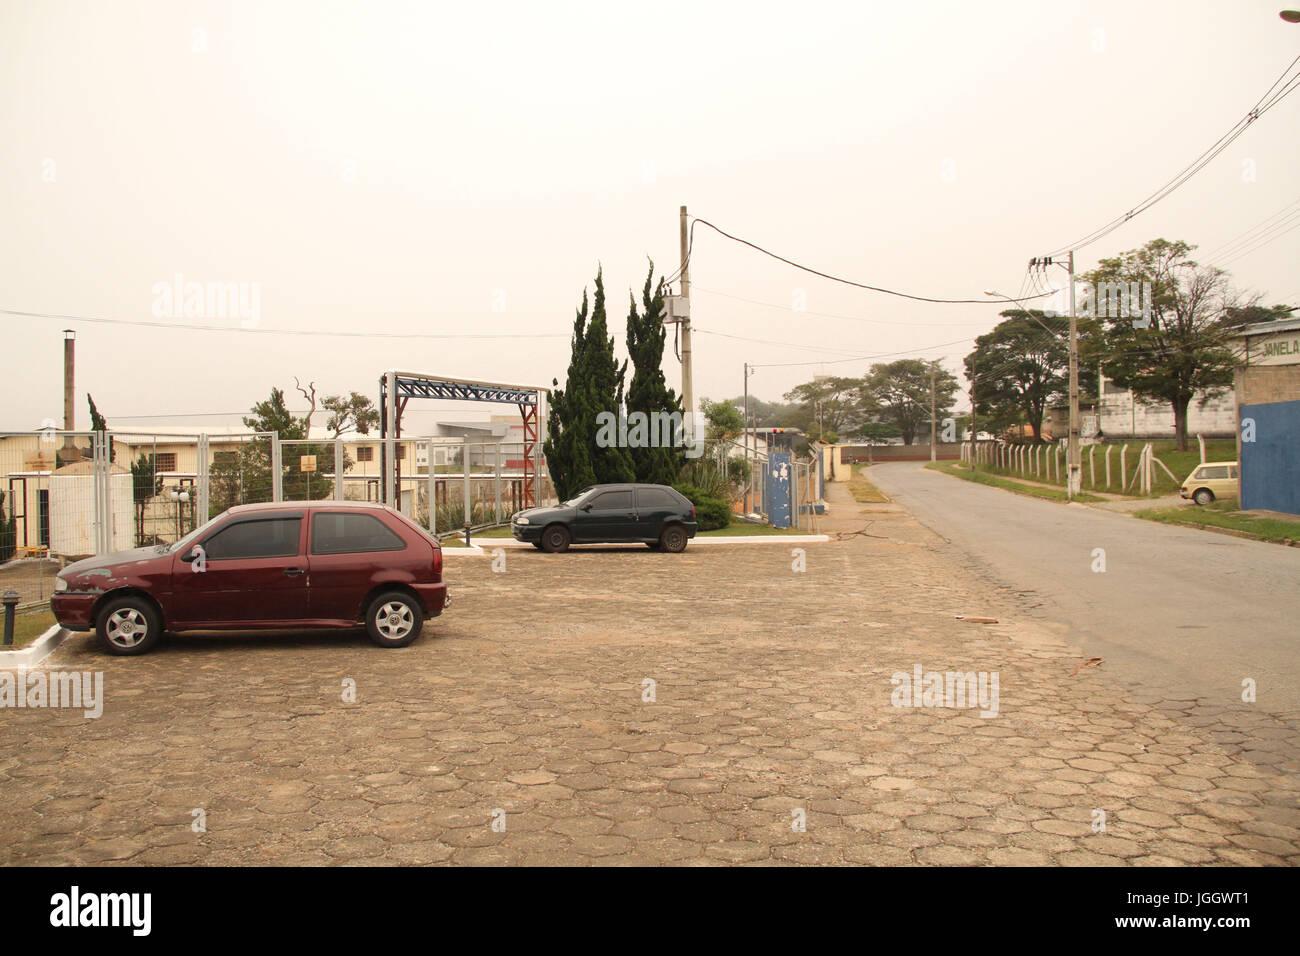 Street, cars, Industrial District, 2016 Lavras, Minas Gerais, Brazil. Stock Photo